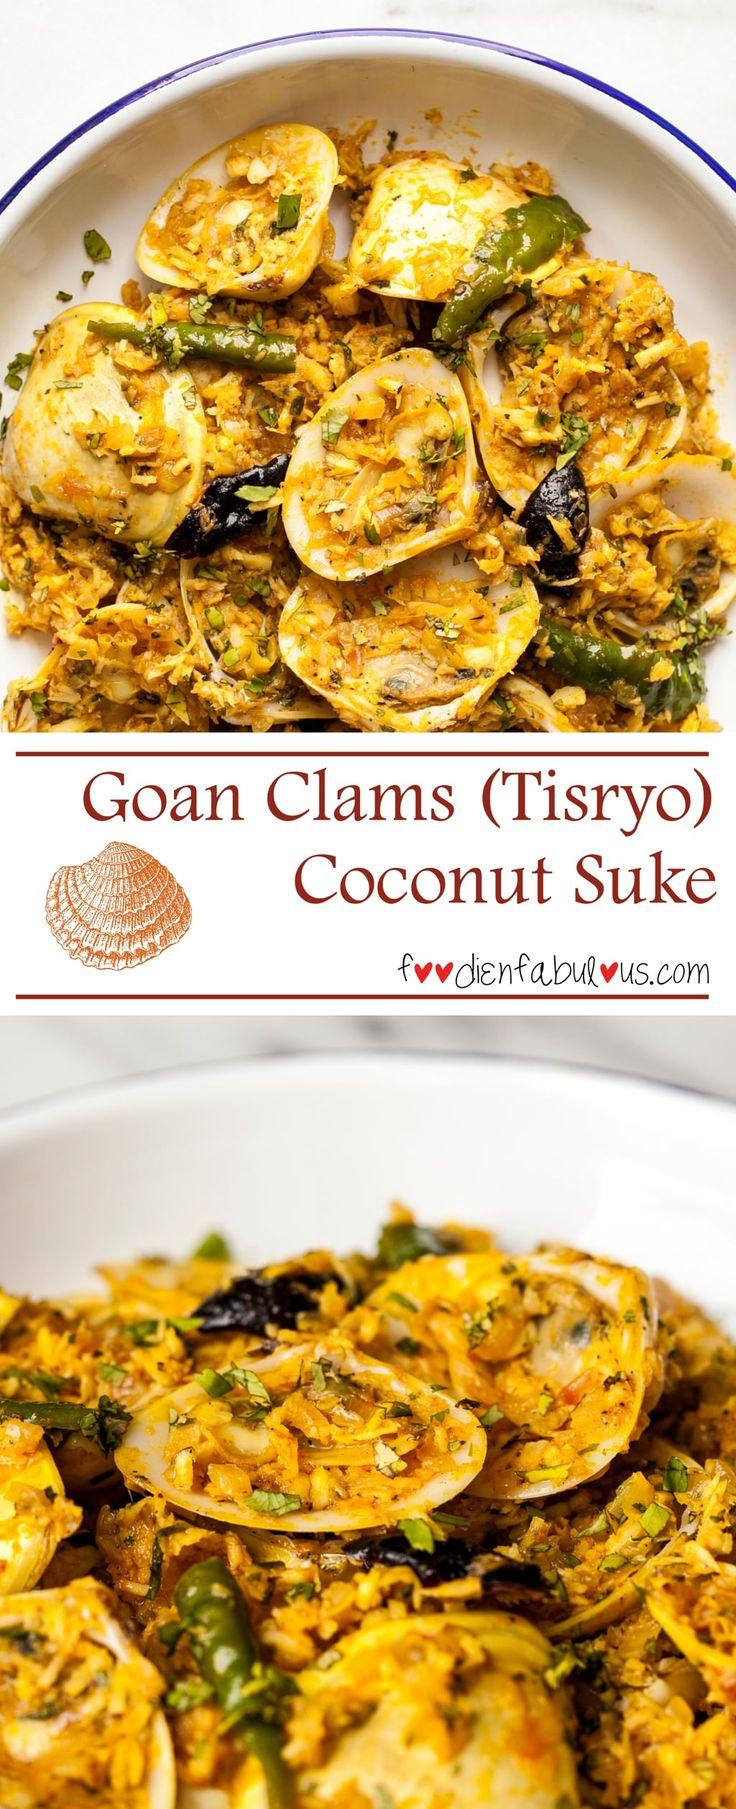 413 best goan images on pinterest goan food goan recipes and easy recipe for a traditional goan tisryo clams suke that is similar to mangalorean forumfinder Gallery